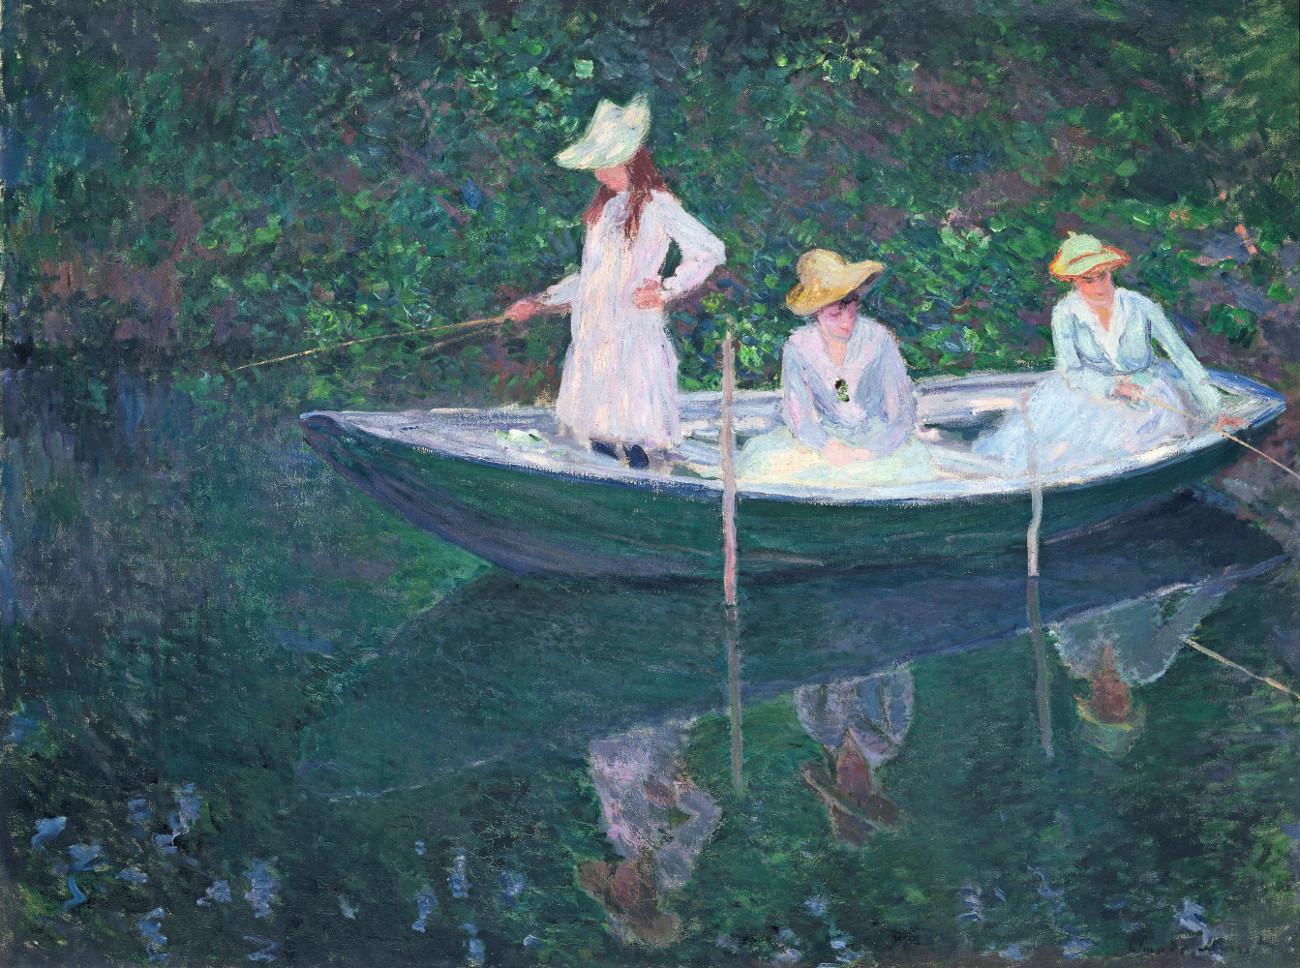 Monet - In der Barke, 1887 (c) RMN-Grand Palais (Musee dOrsay) Herve Lewandowski